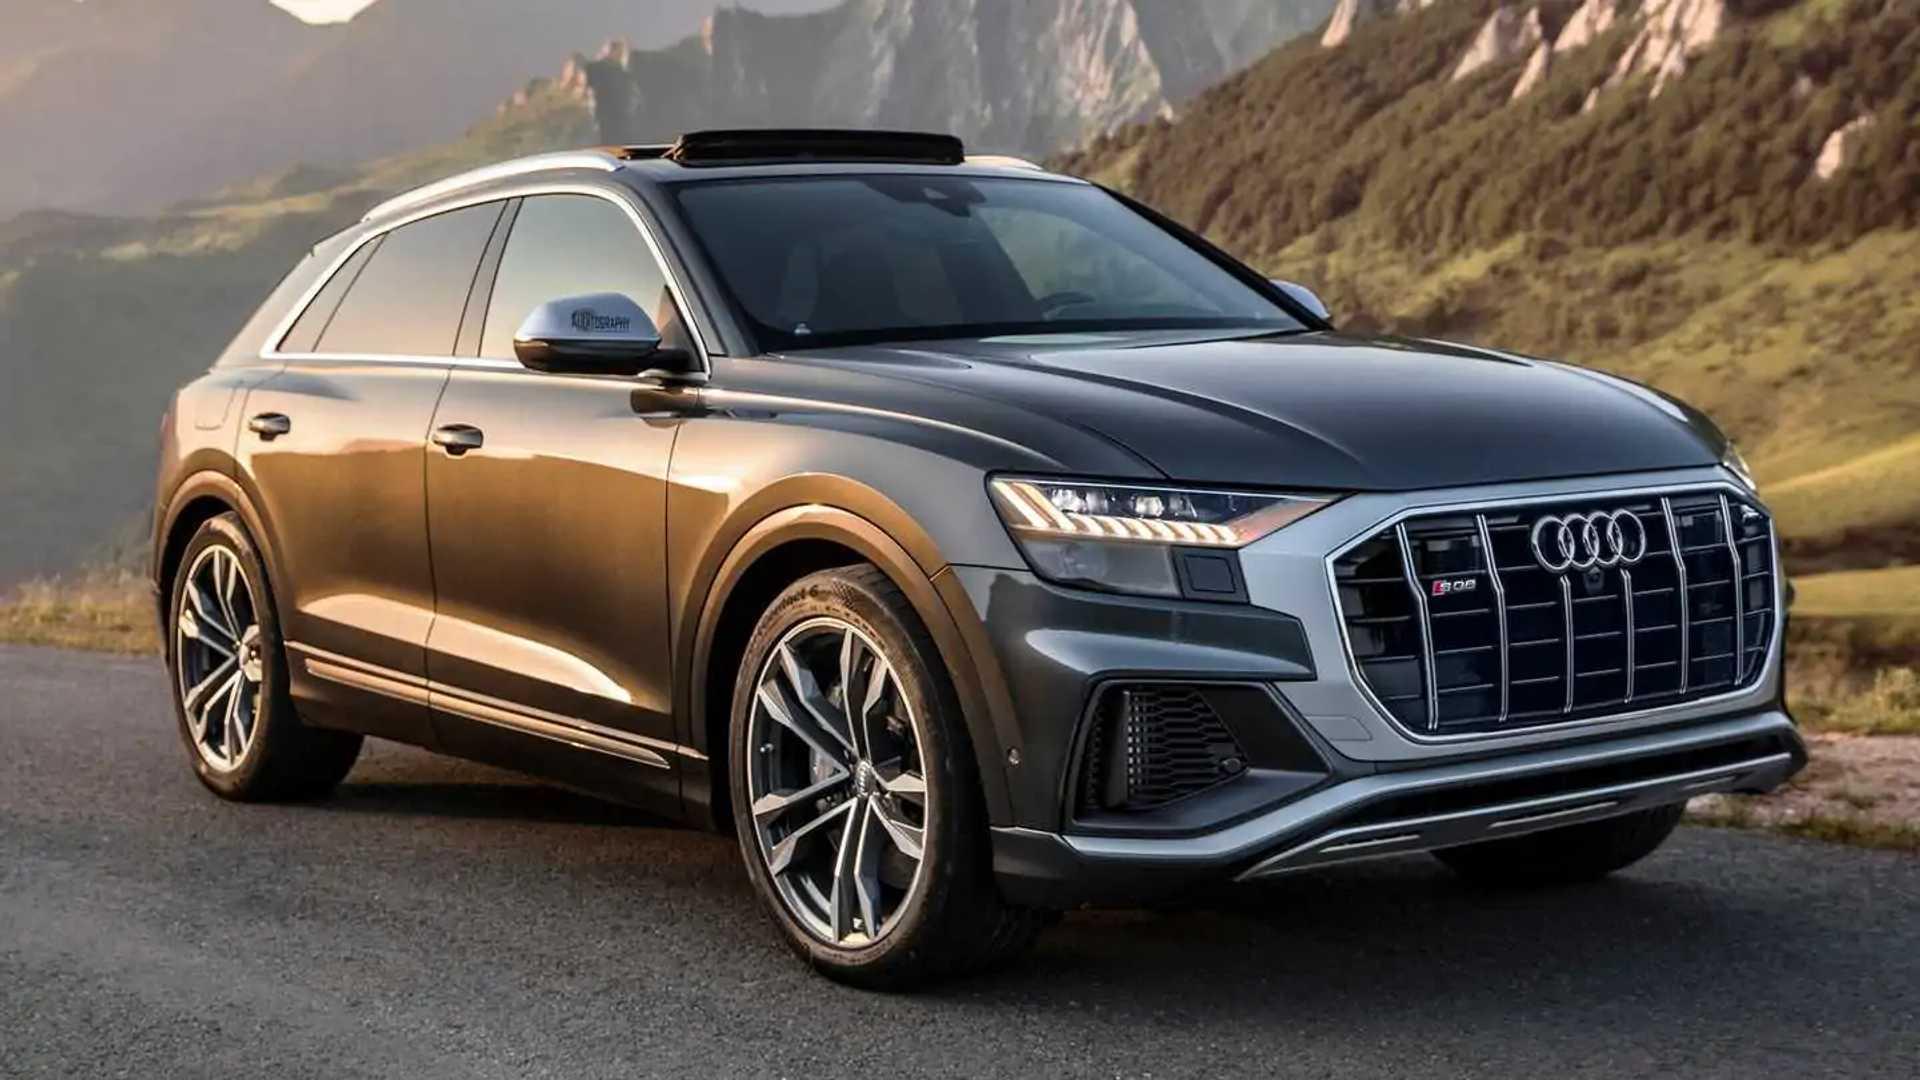 2020 Audi Q8: News, SQ8, RS Q8, Price >> 2020 Audi Sq8 First Videos Highlight The Diesel Suv Monster